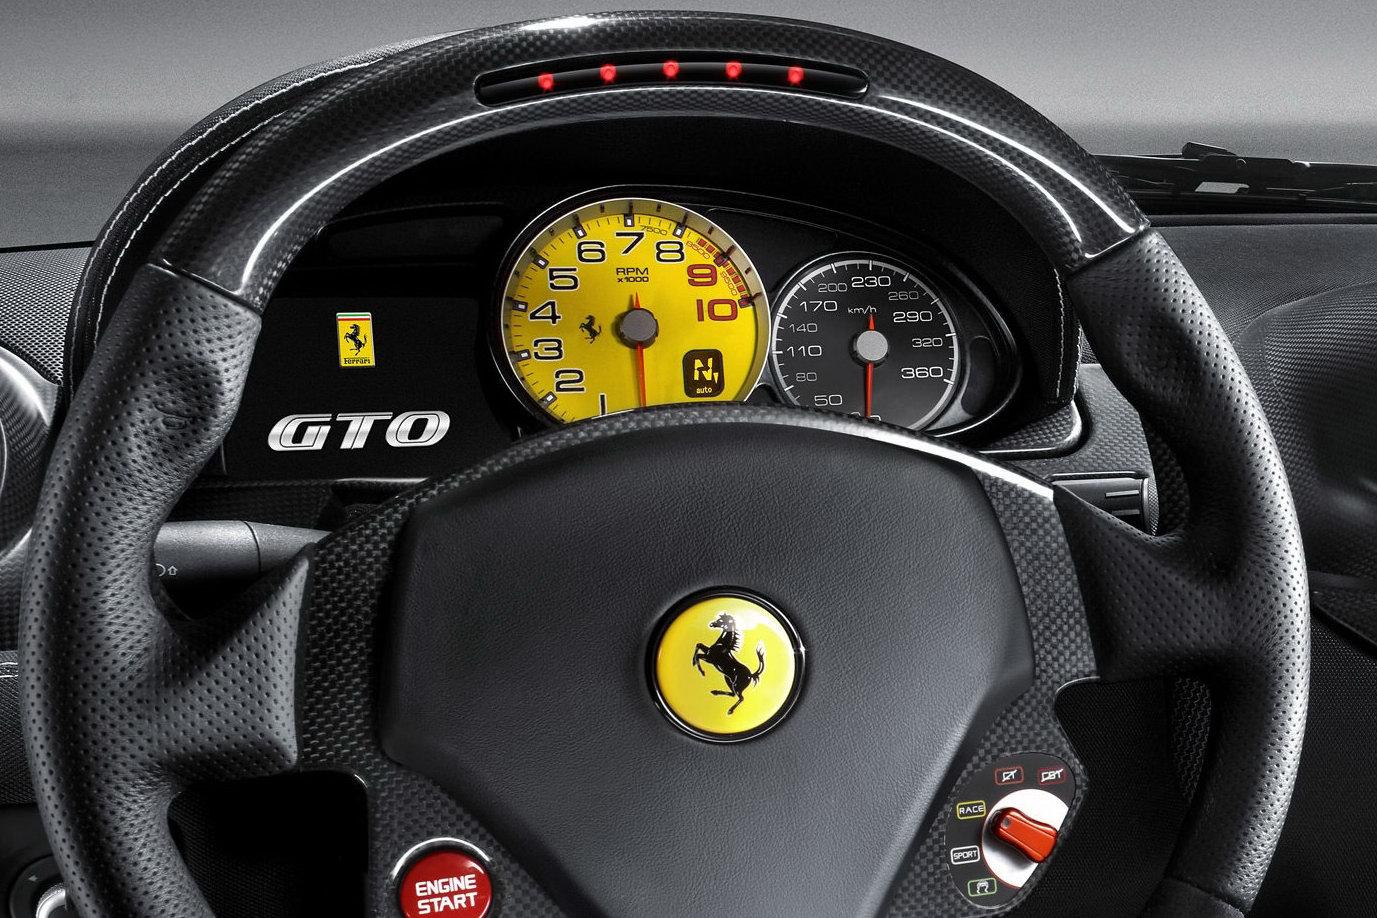 http://4.bp.blogspot.com/_FoXyvaPSnVk/S73uhHKI3LI/AAAAAAACufc/ovu4TT2Ablw/s1600/Ferrari-599-GTO-6.jpg